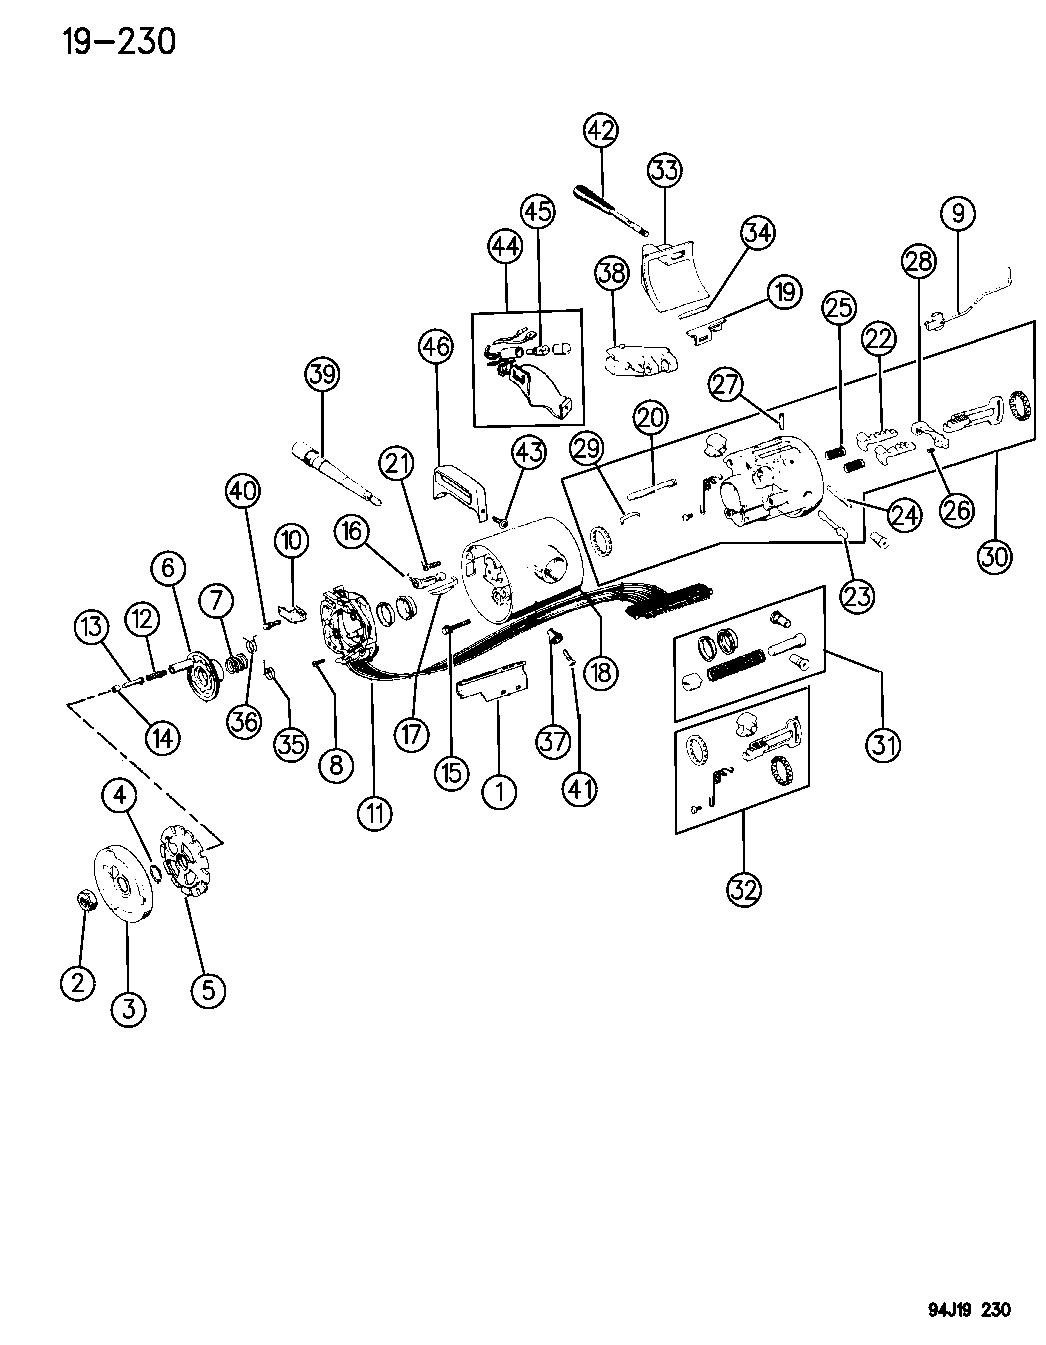 resource?t=d&s=l&r=AB690C35588EE91CEEB36A2A602A8A4BBFFBB92F8BA67FFF908C273561F629AA 1994 jeep wrangler housing steering column upper